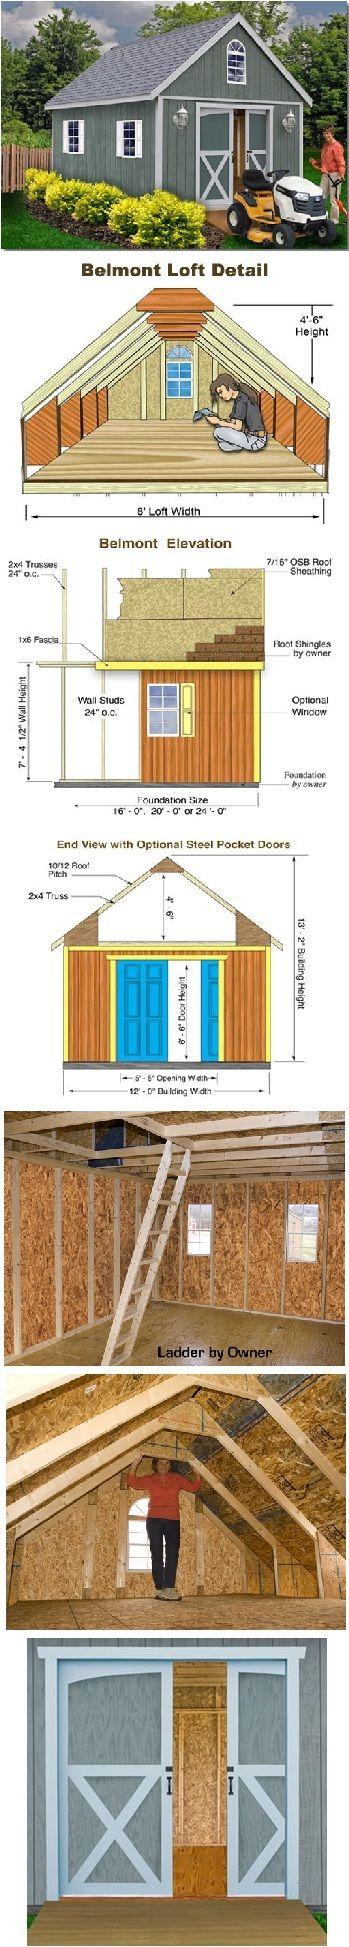 Belmont 12 ft x 16 ft Best Barn Wood Shed Kit